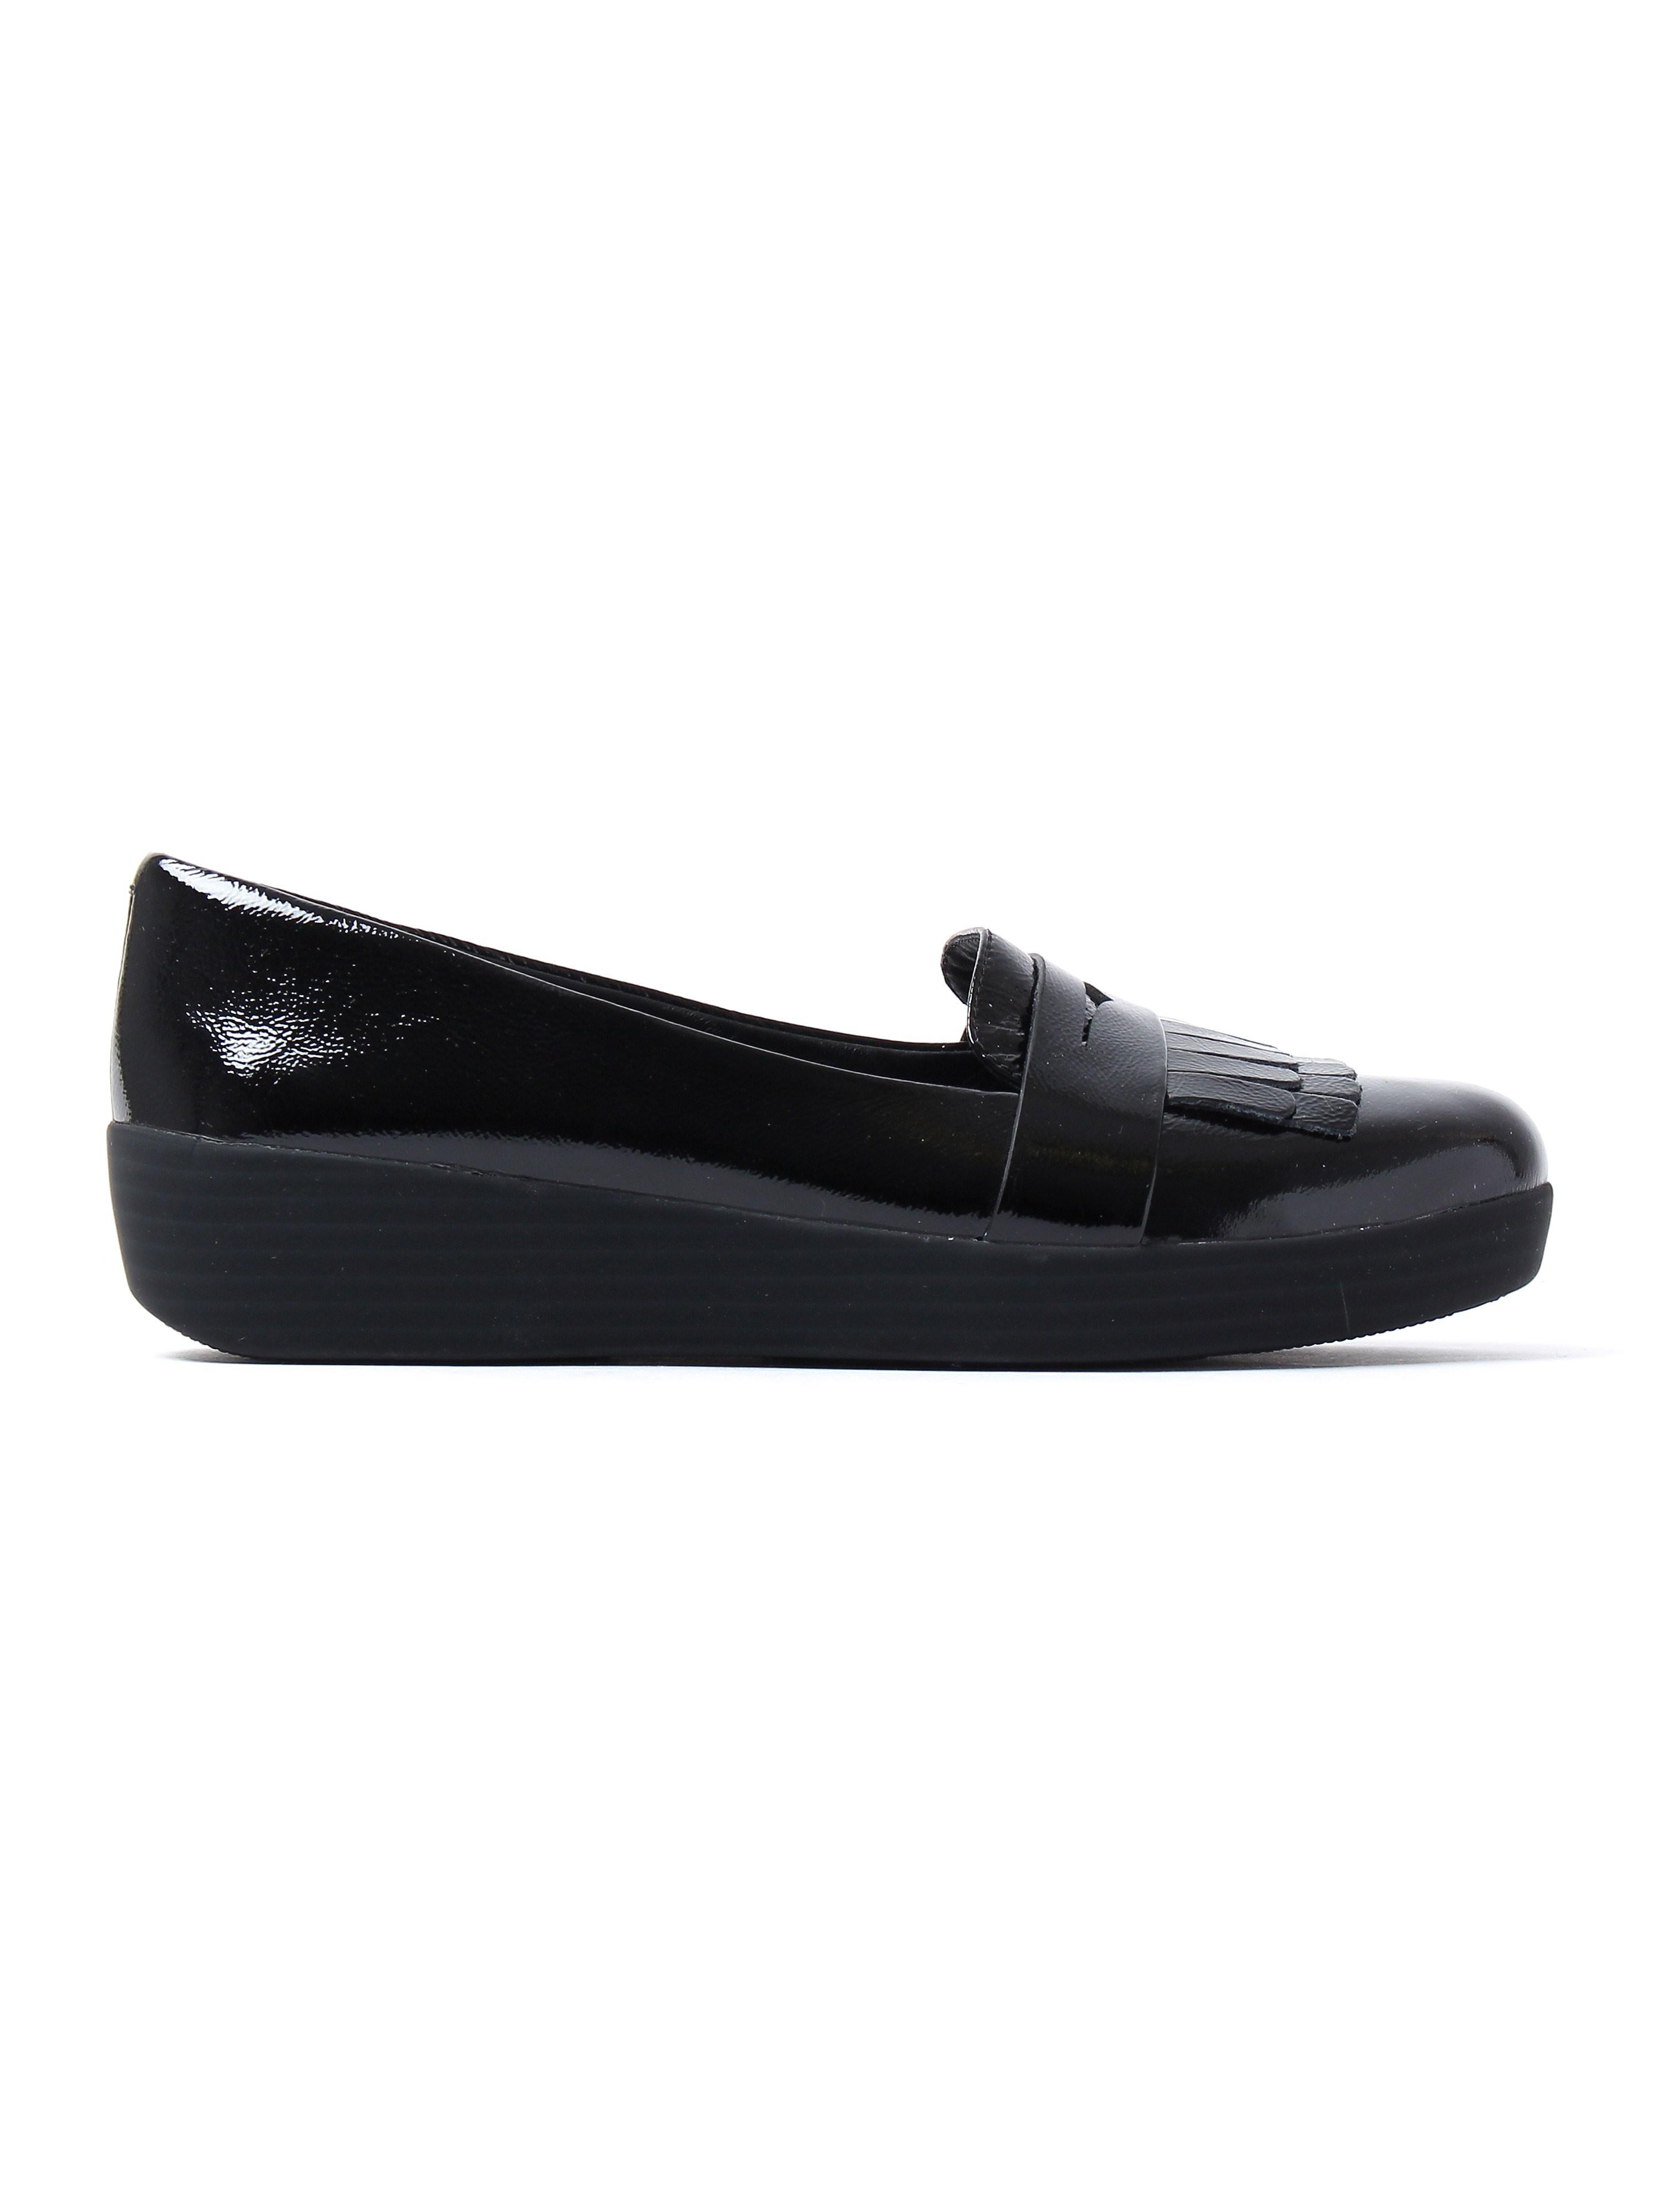 FitFlop Women's Fringey Sneaker Loafers - Black Patent